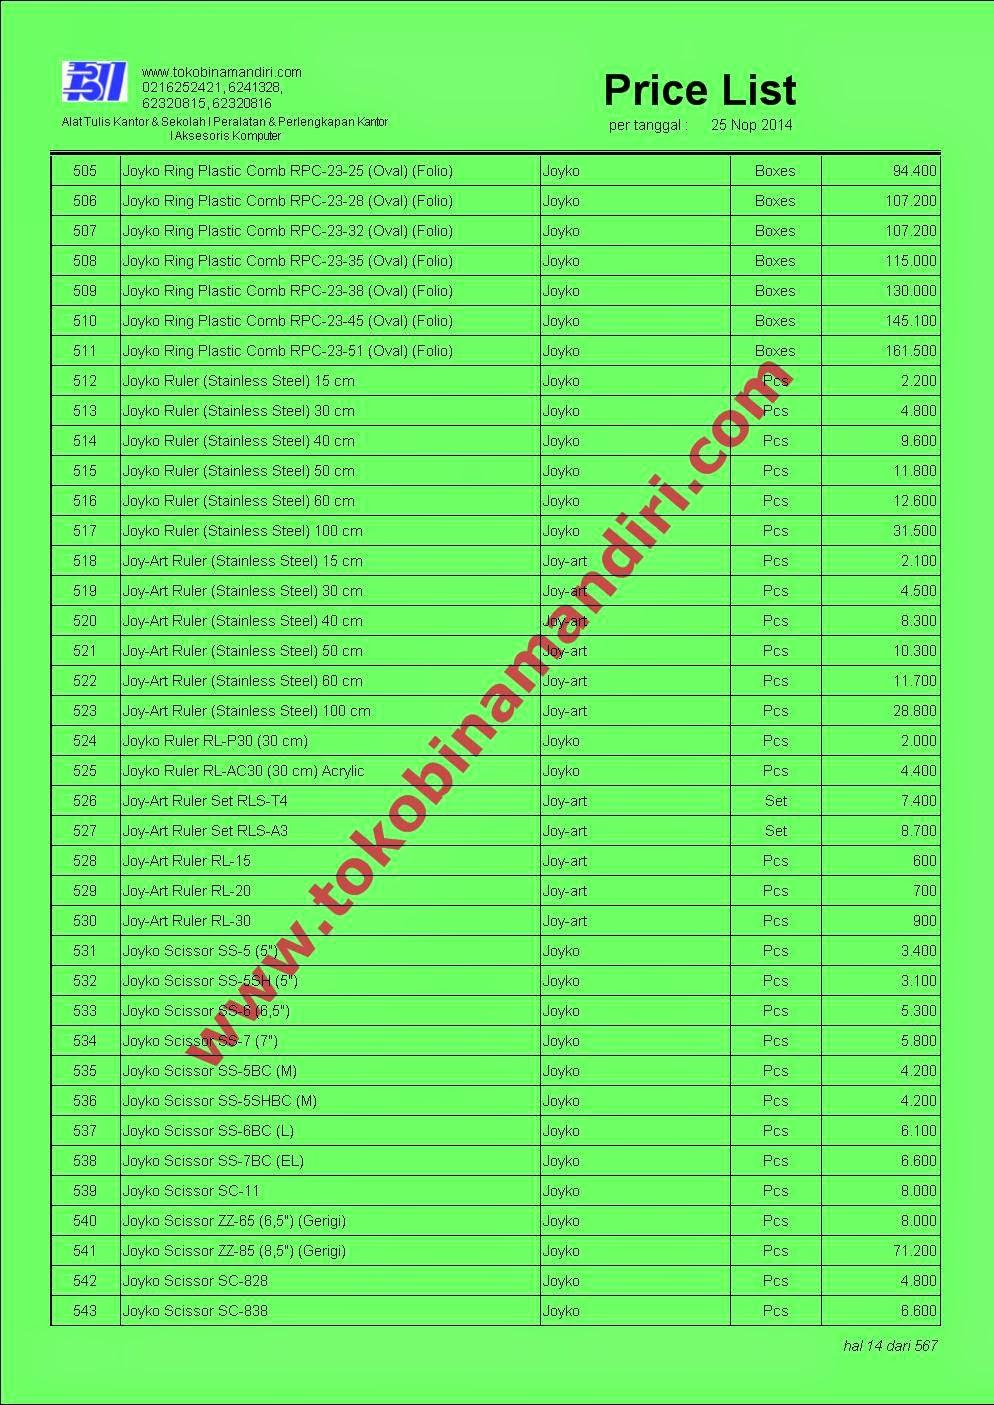 Harga Atk 2013 Icefilmsinfo Globolister Wallpapers 5 List Of Daftar Harga Atk 2015 Apr 2016 Nfl Wallpapers